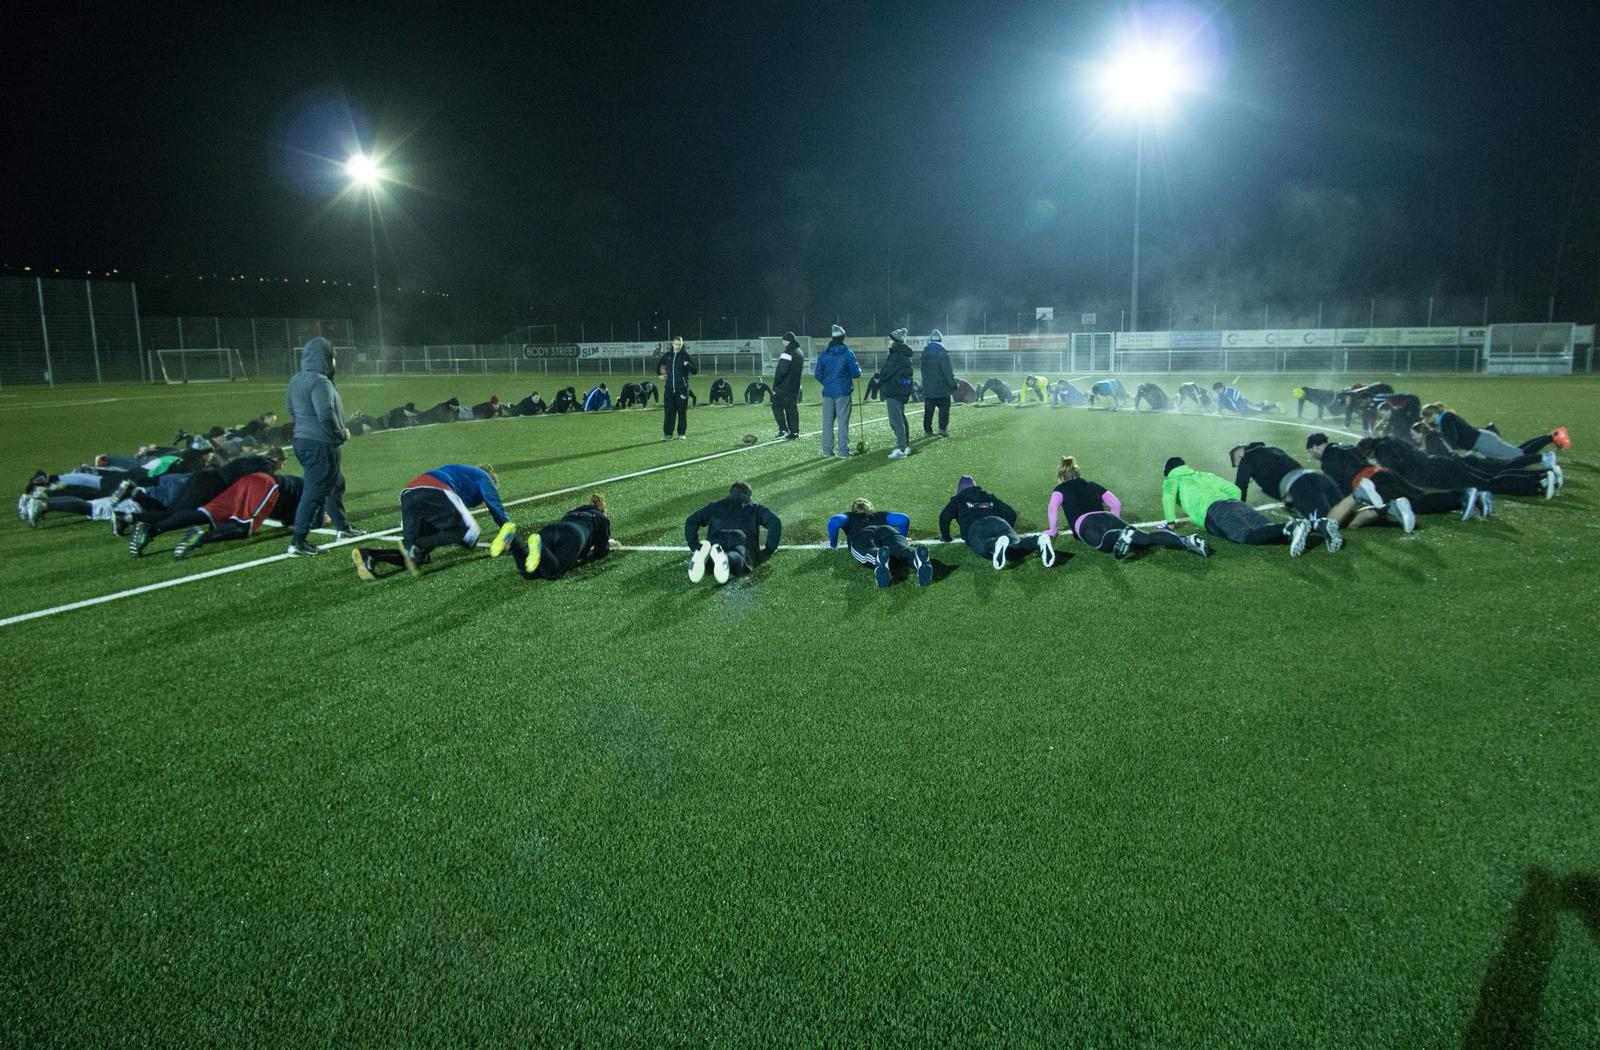 Stampers auf neuem Terrain und Football meets Sweet Karma Yoga